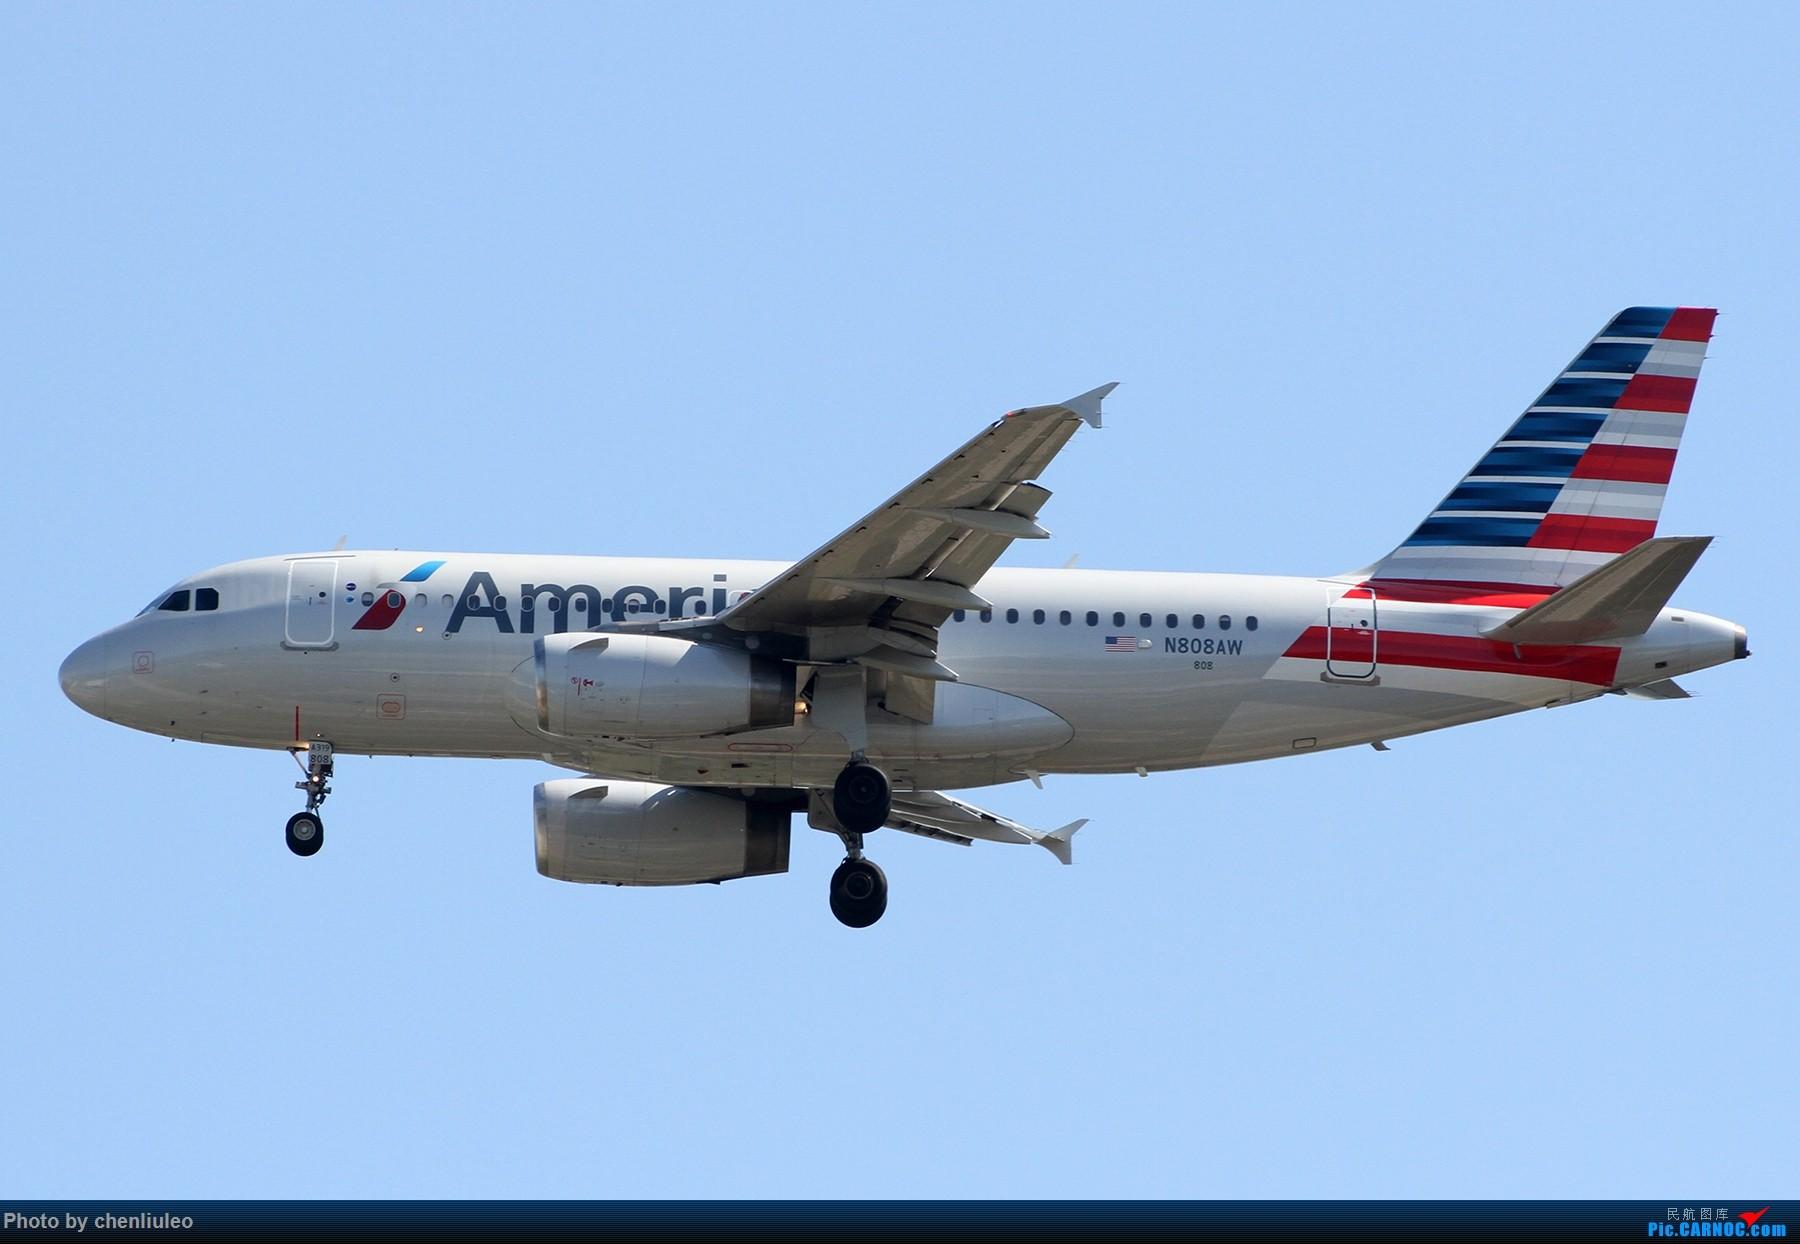 Re:【北美飞友会】本来是去等西南航空的新加州一号彩绘 结果有意外惊喜 美军C-40C AIRBUS A319-100 N808AW 美国圣路易斯机场